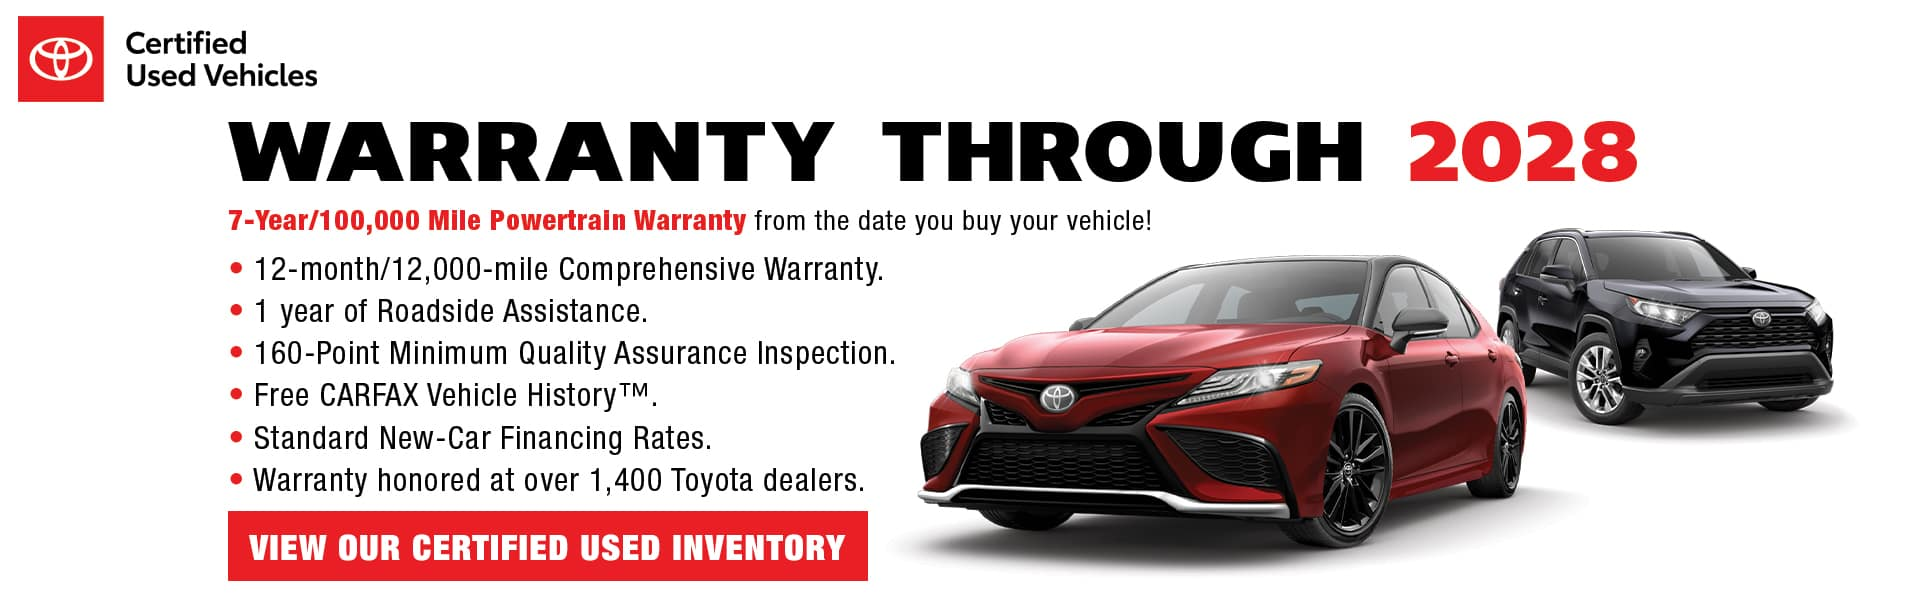 IraToyota_CertifiedUsed_Warranty_Slide_01-2021R